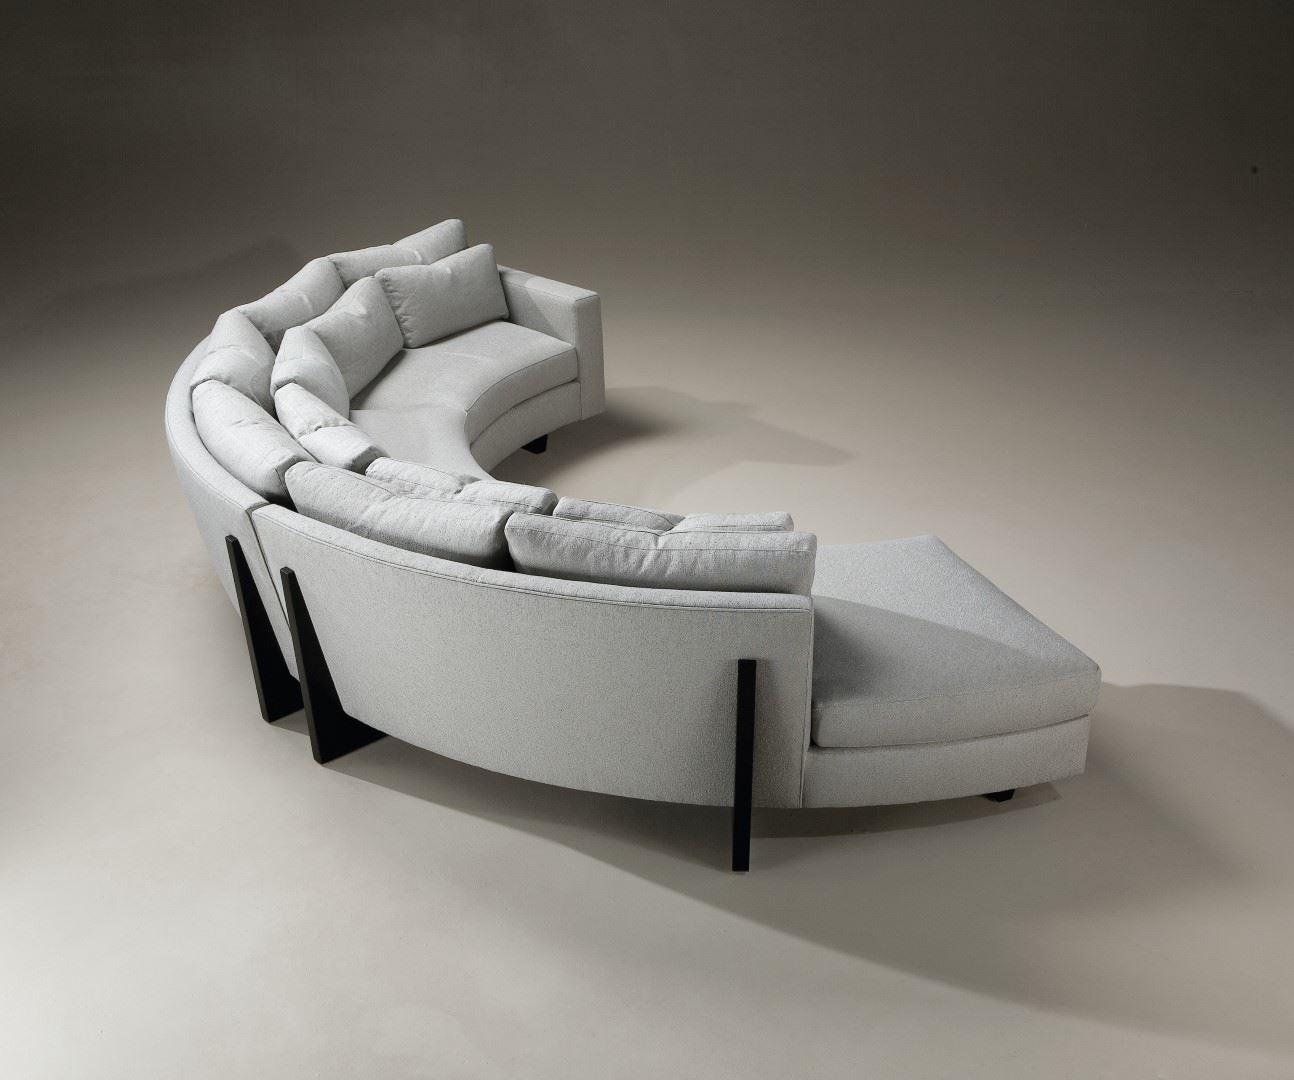 Semi Circular Couch